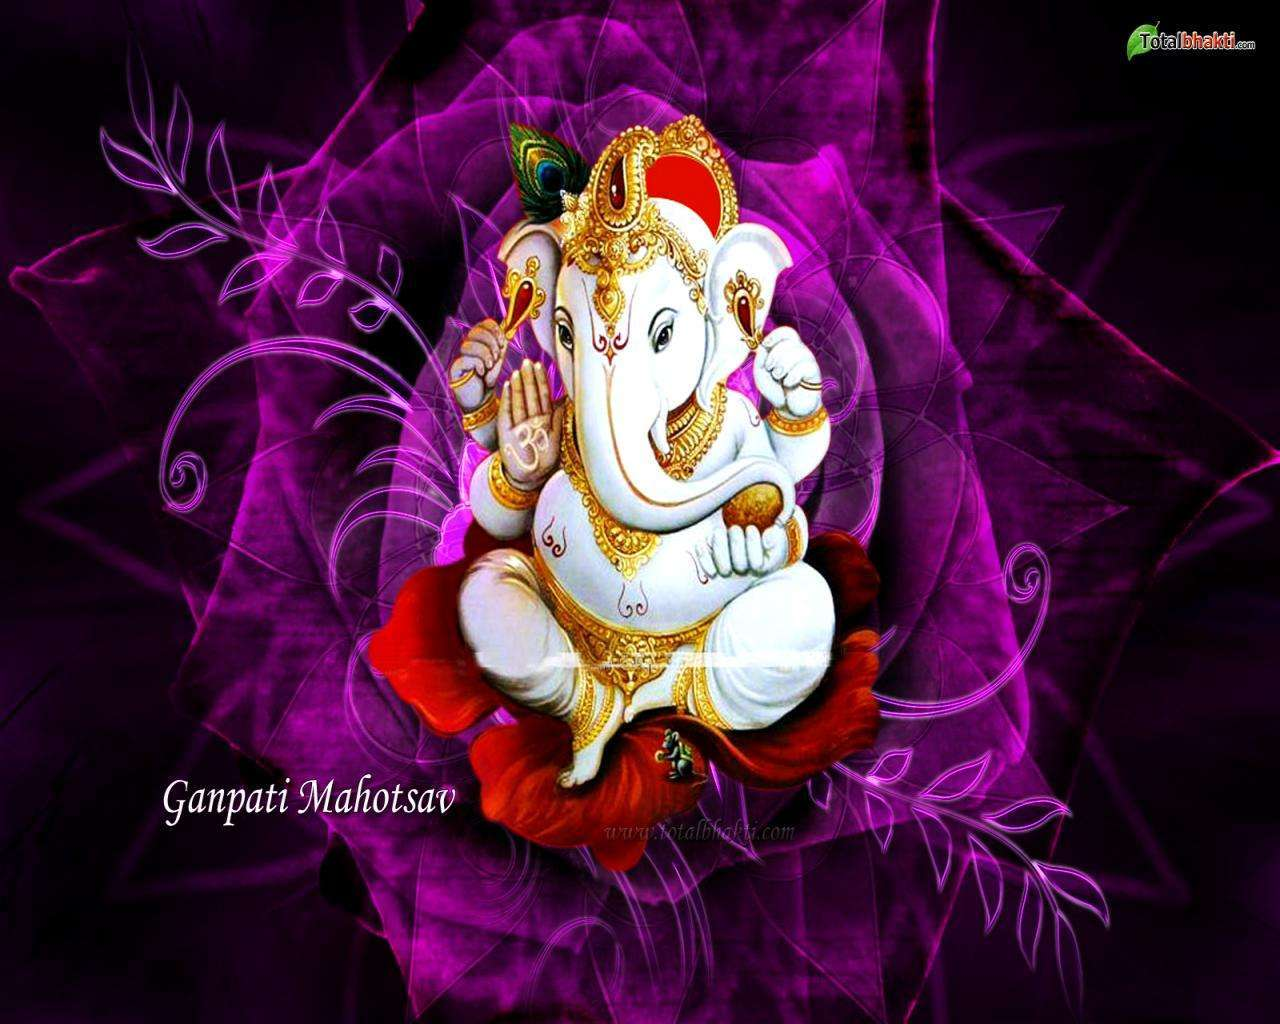 51 Best Ganesha Wallpapers   Series 6 Wallpapers 1280x1024